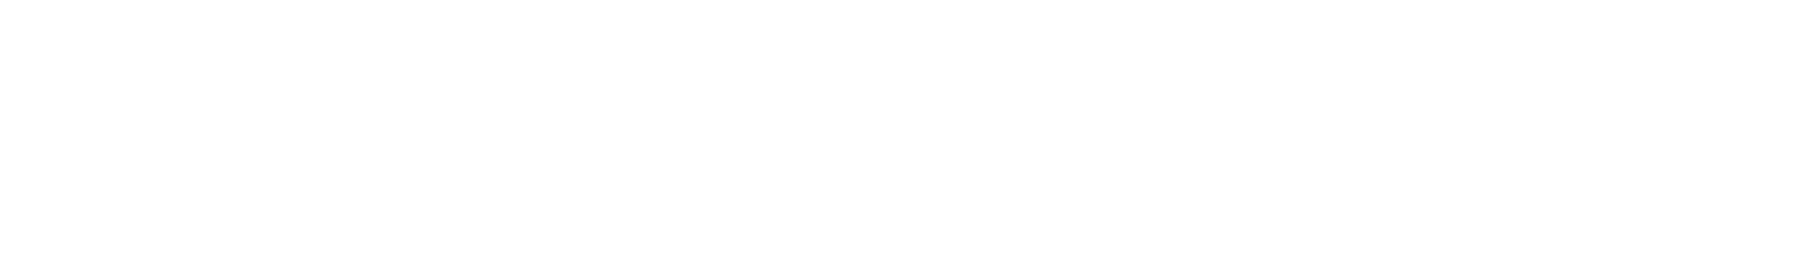 116 verbbassline c